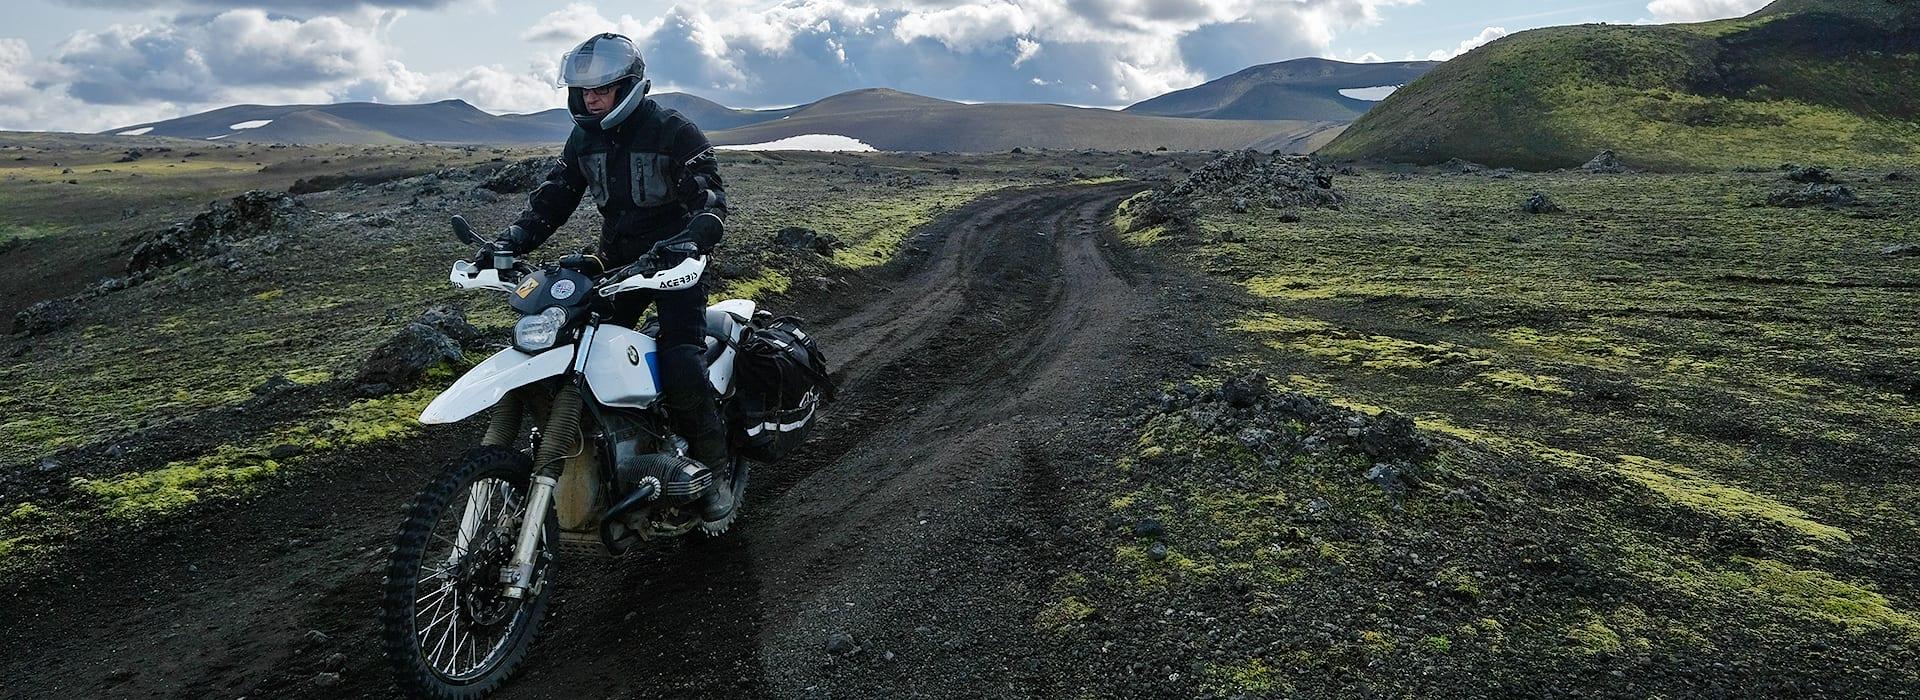 Motorreis Seven Summits